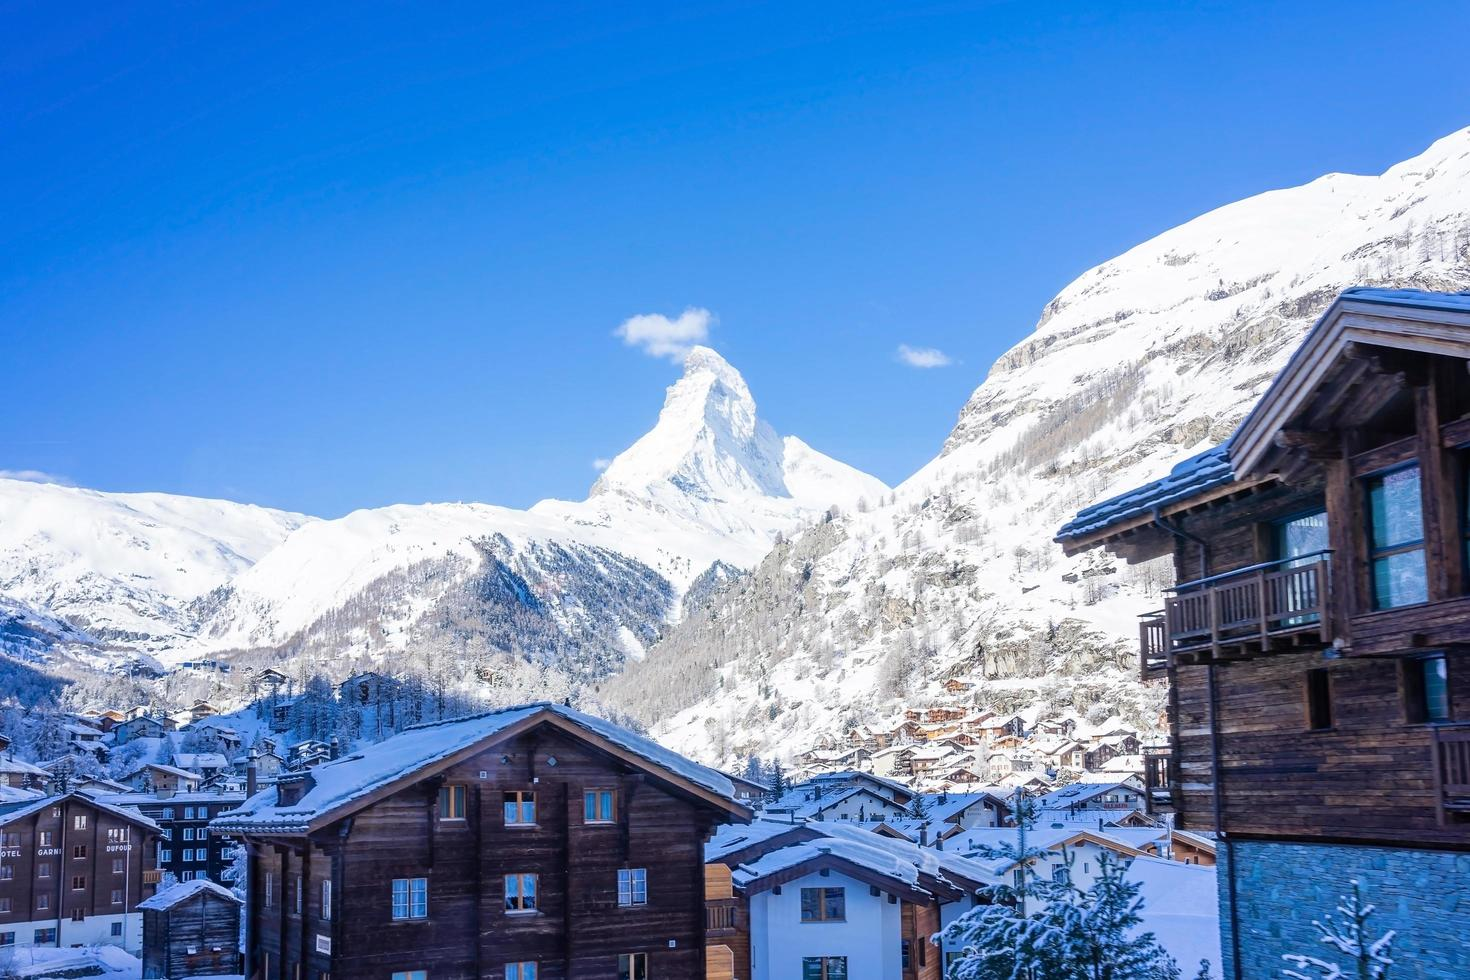 vista del cervino da zermatt in svizzera foto